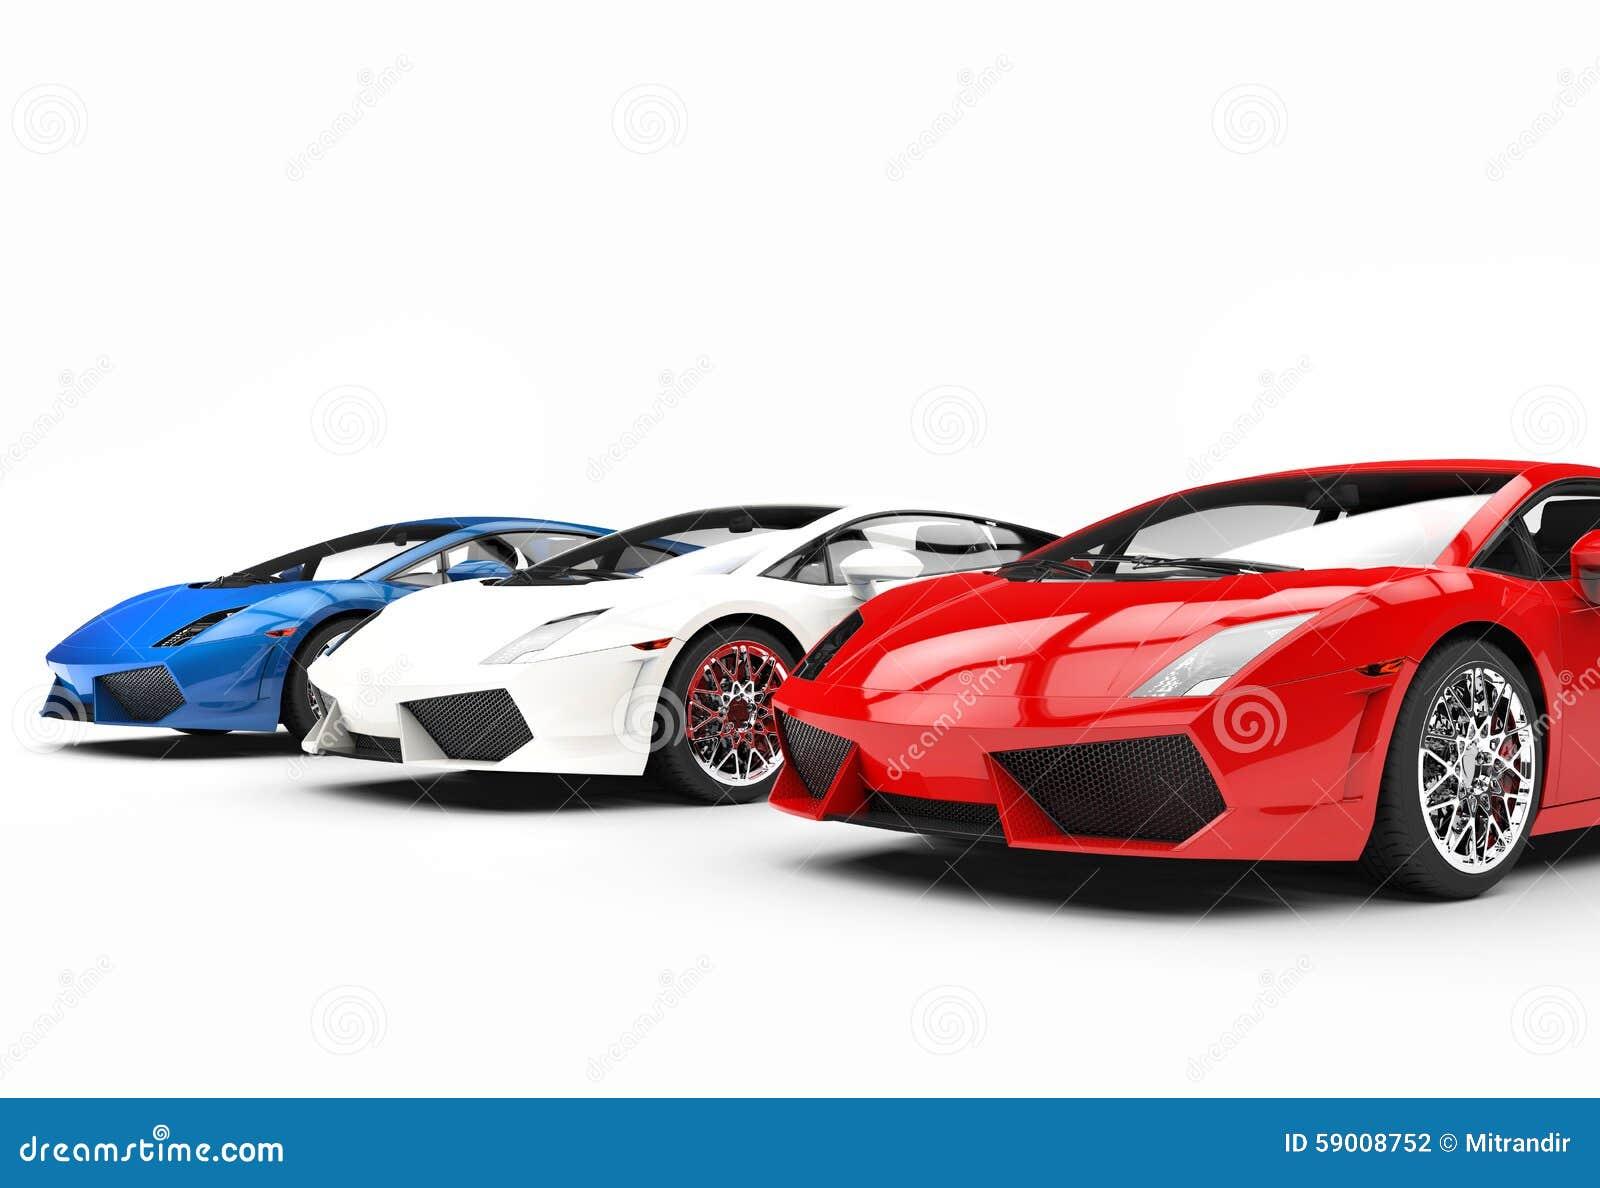 red white and blue supercars stock illustration illustration of bling motor 59008752. Black Bedroom Furniture Sets. Home Design Ideas